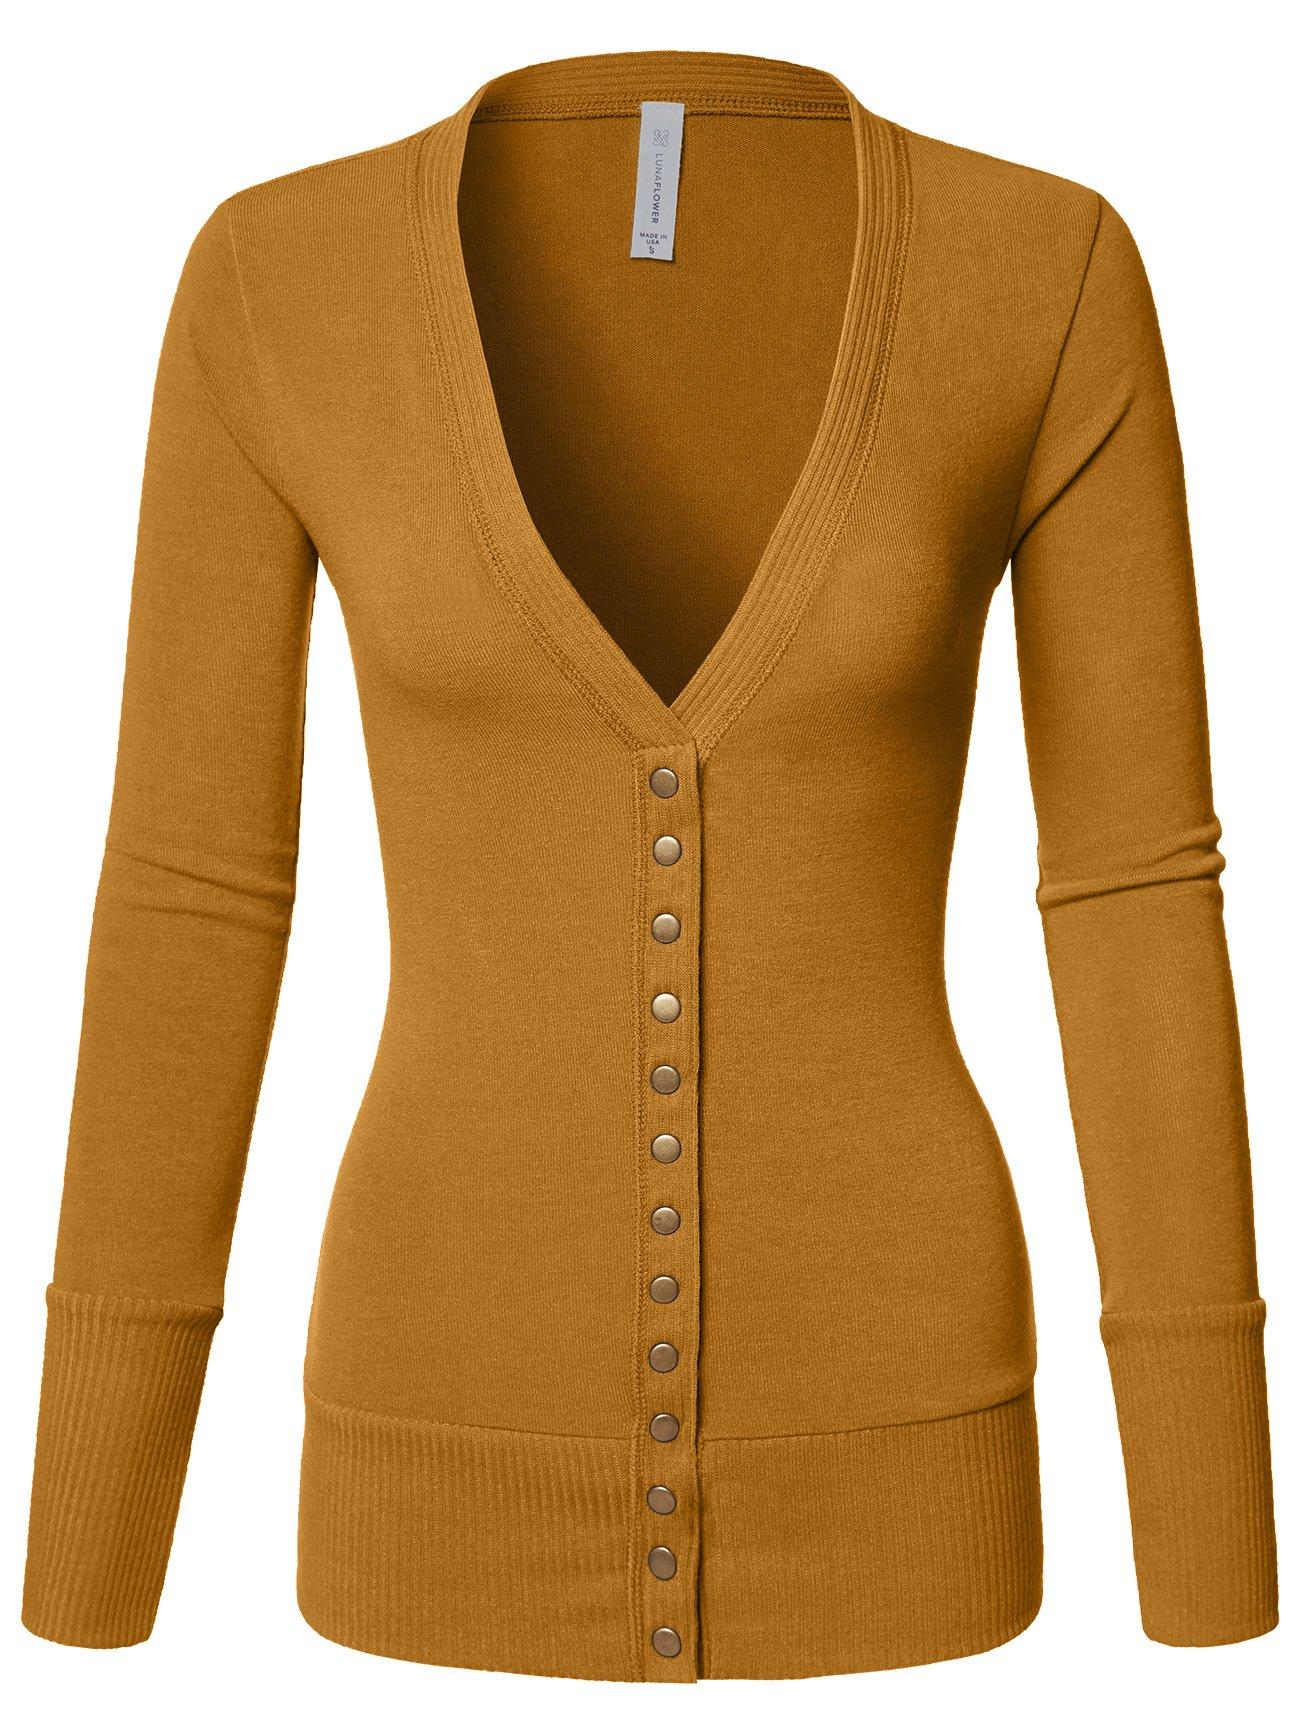 Luna Flower Women's V-Neck Snap Button Long Sleeve Soft Basic Knit Snap Cardigan Sweater ASH_Mustard Medium (GCDW027)